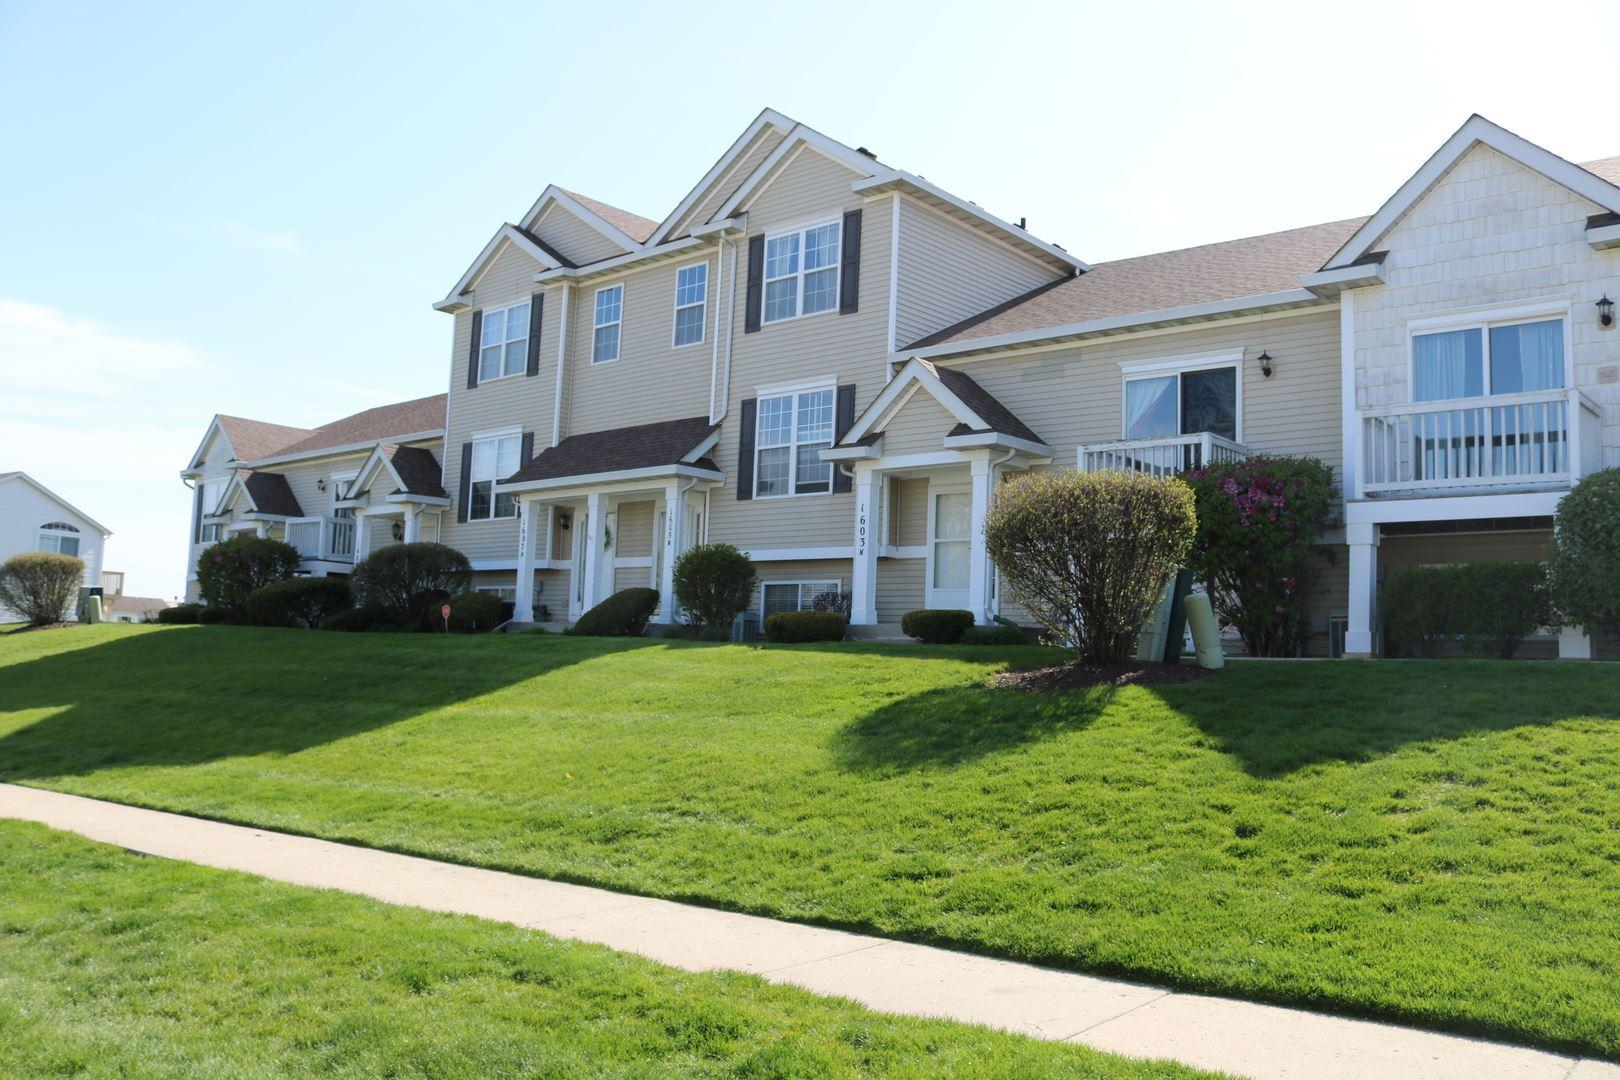 Photo of 1605 Fieldstone Drive, Shorewood, IL 60404 (MLS # 11068860)